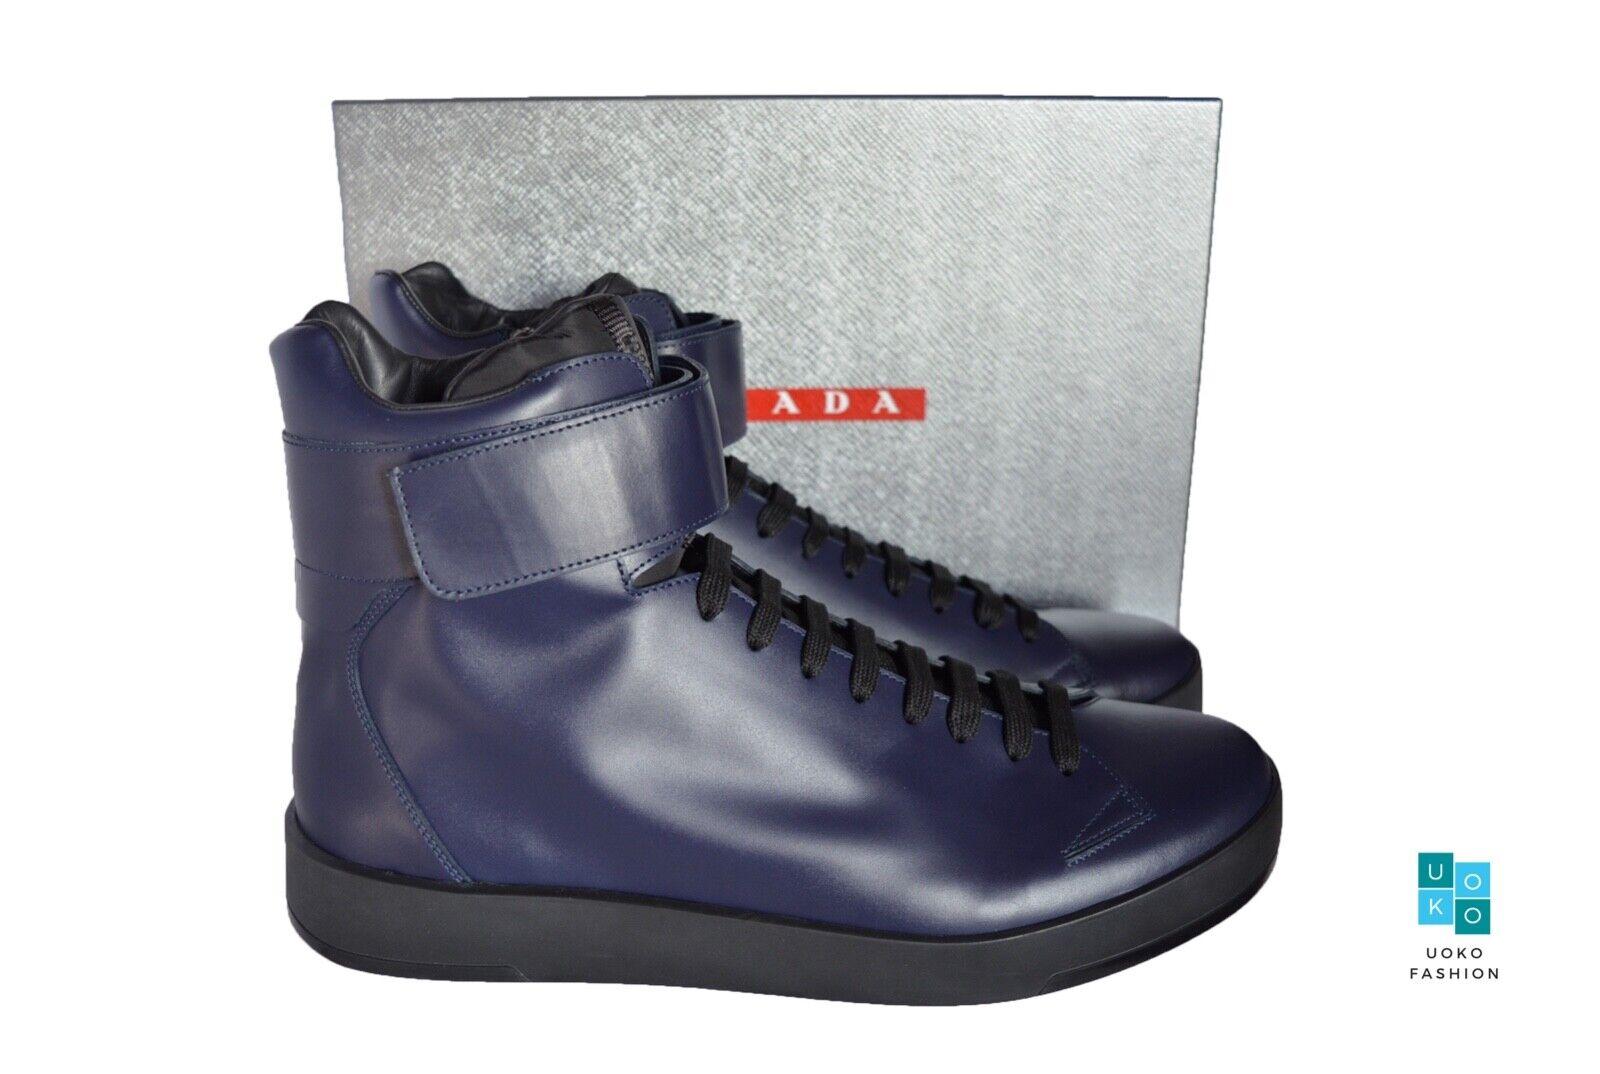 New in Box Authentic PRADA Mens Shoes Sz US12 EU45 UK11 4T3016